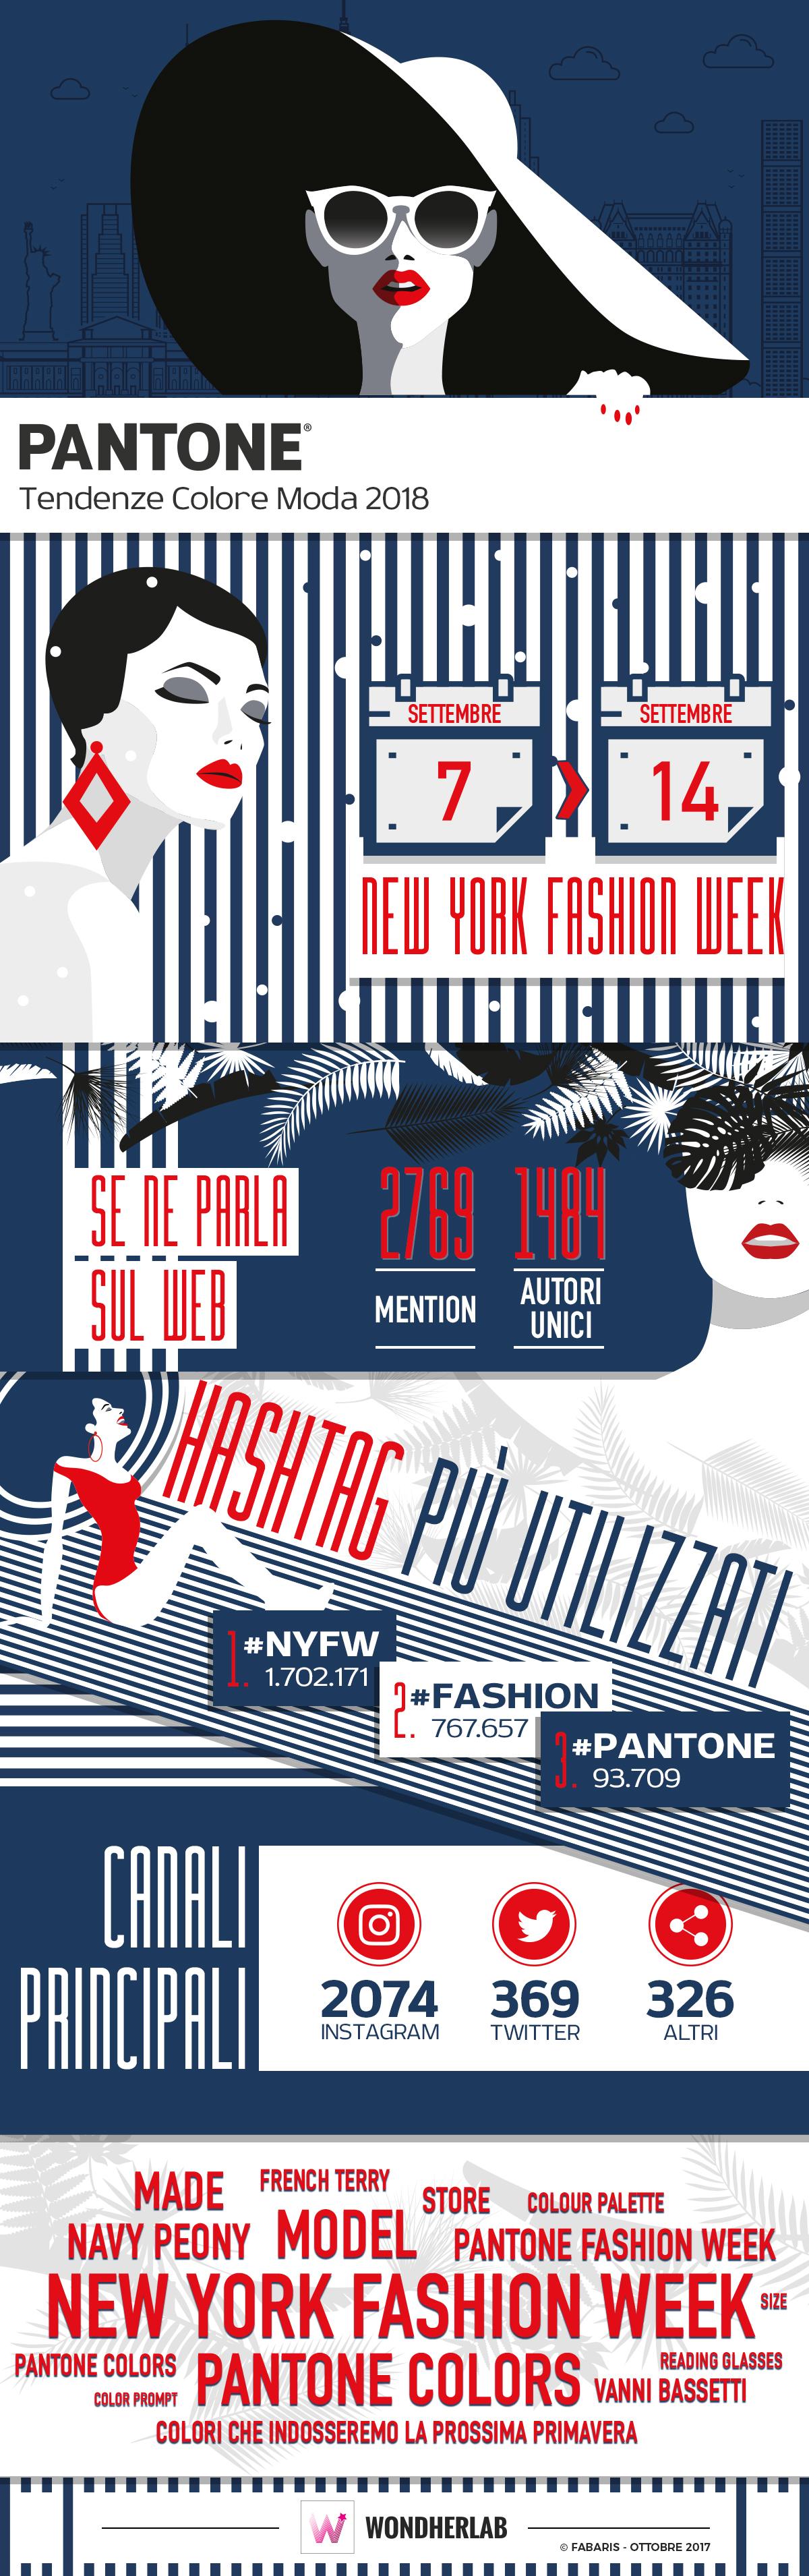 Infografica Pantone: tendenze colore moda 2018- Fashion week New York - Navy Peony